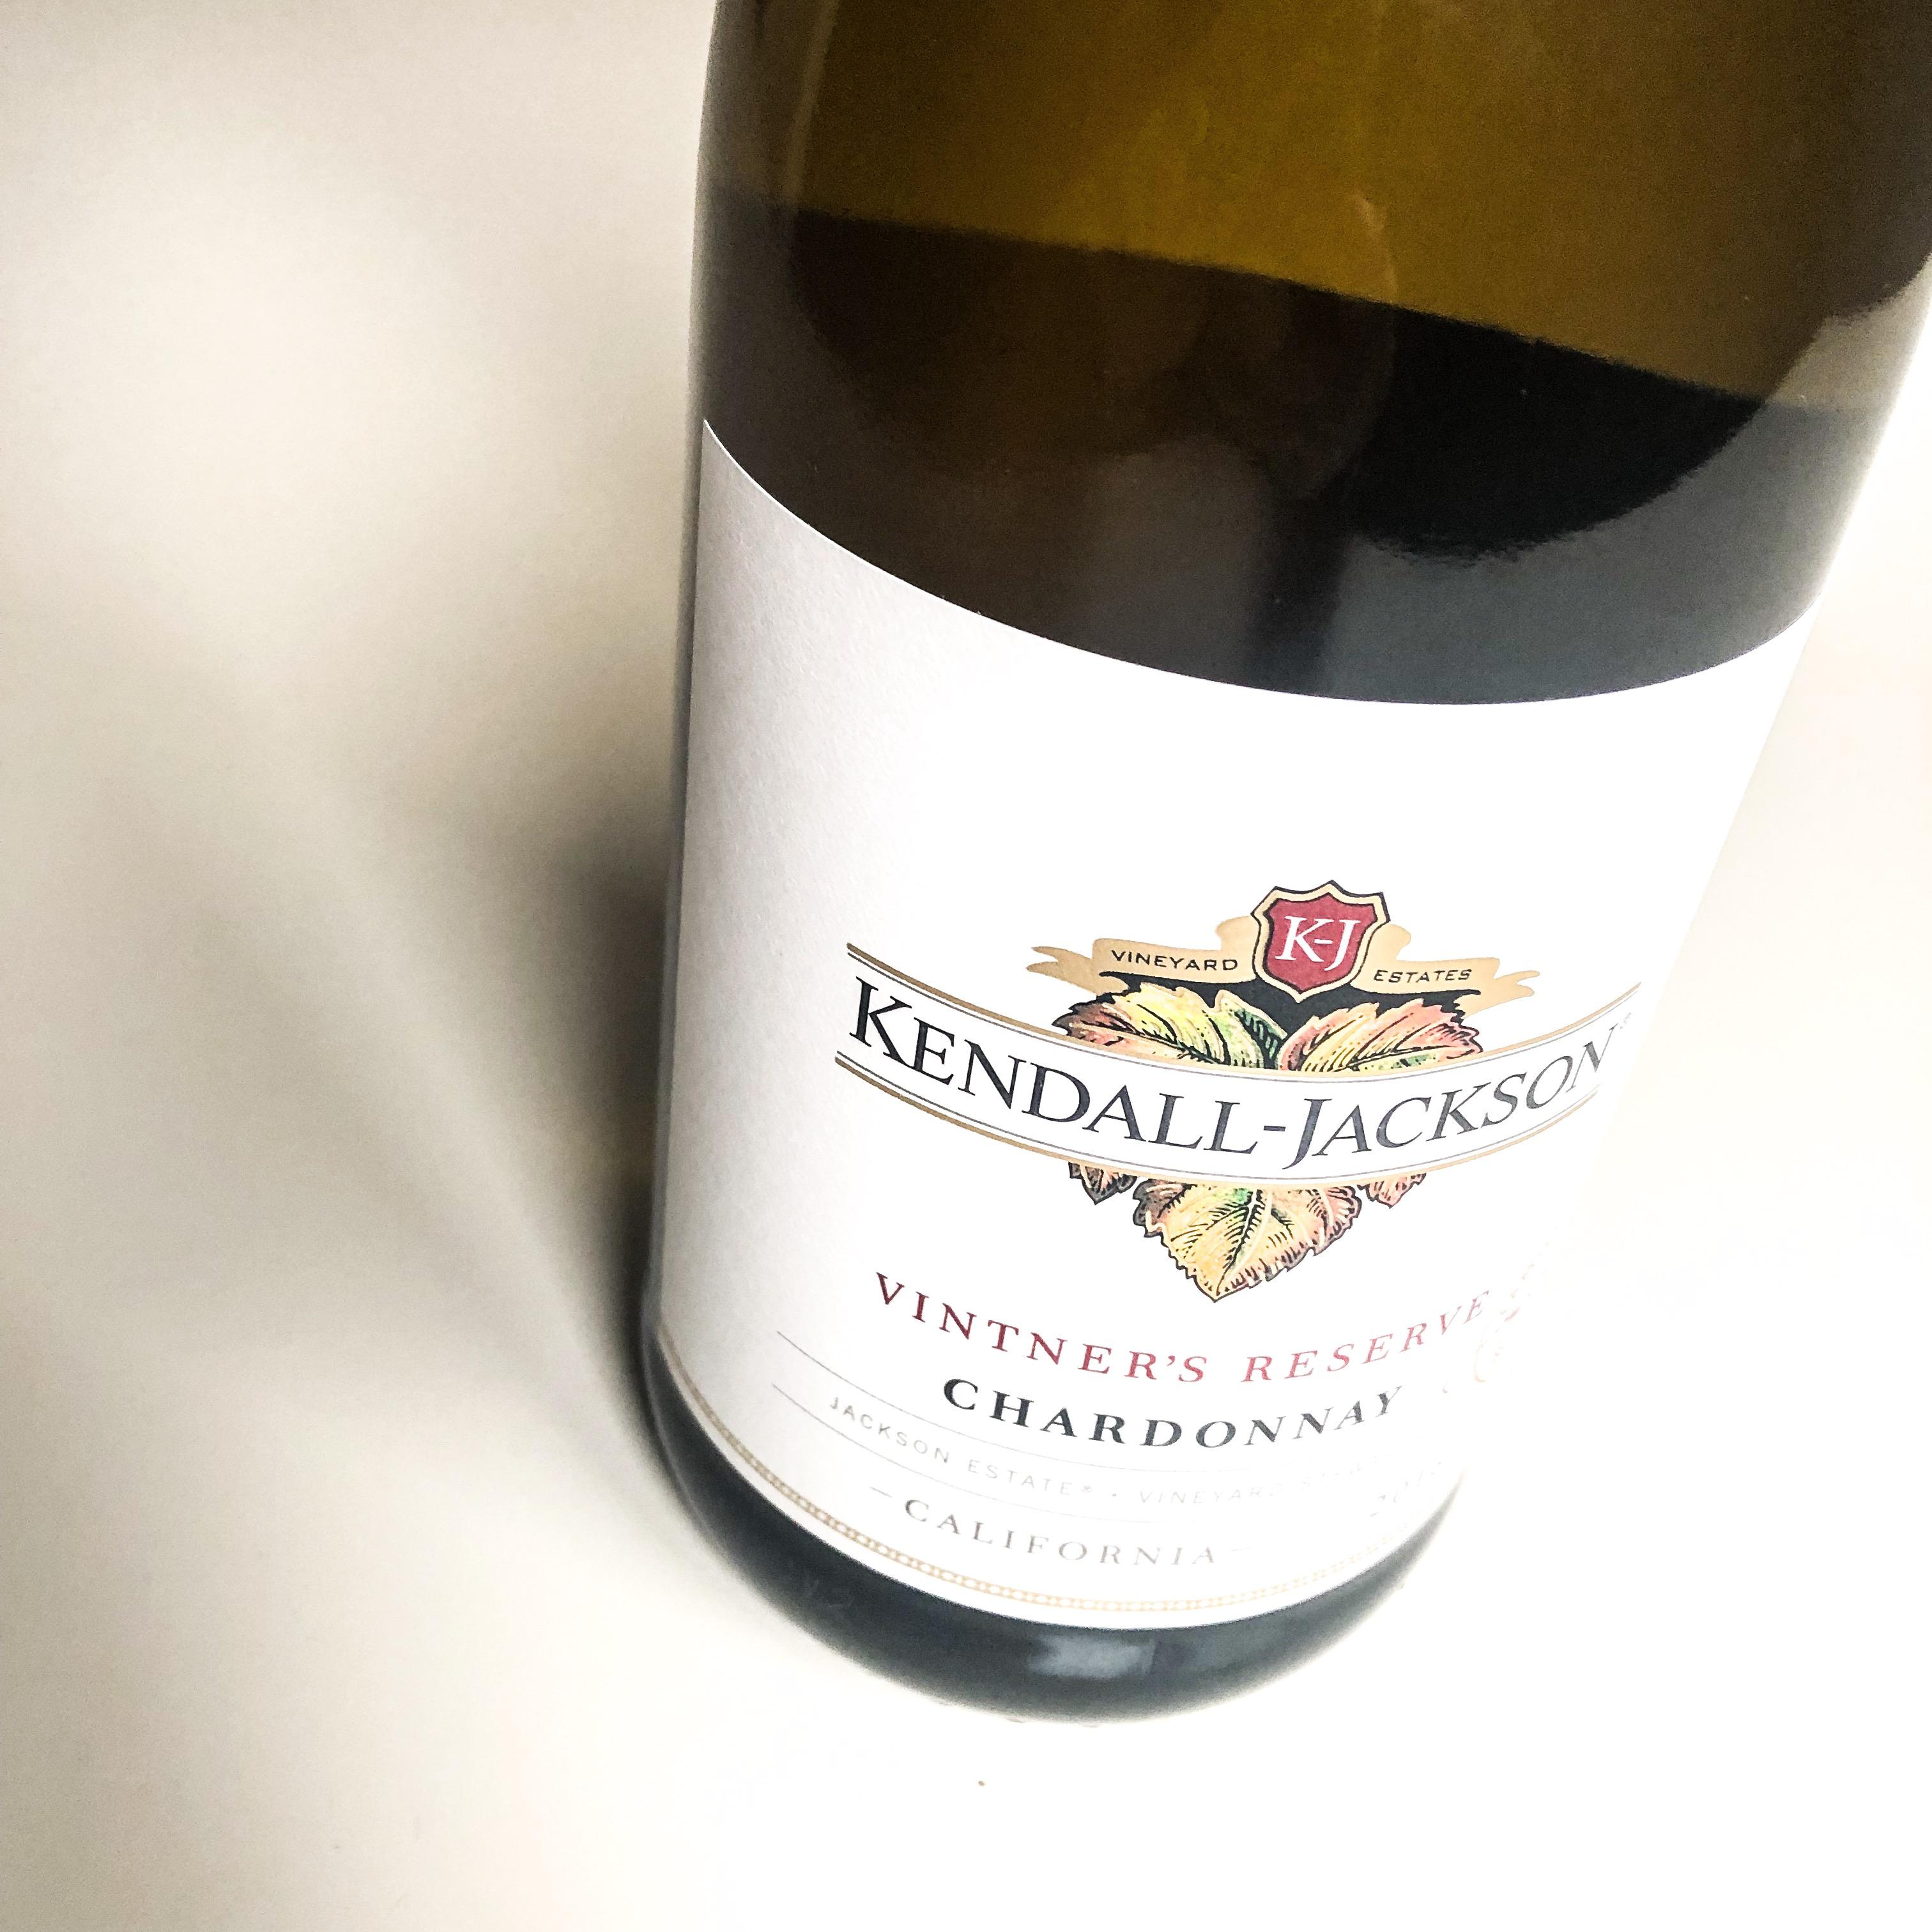 Kendall Jackson Vintners Reserve Chardonnay